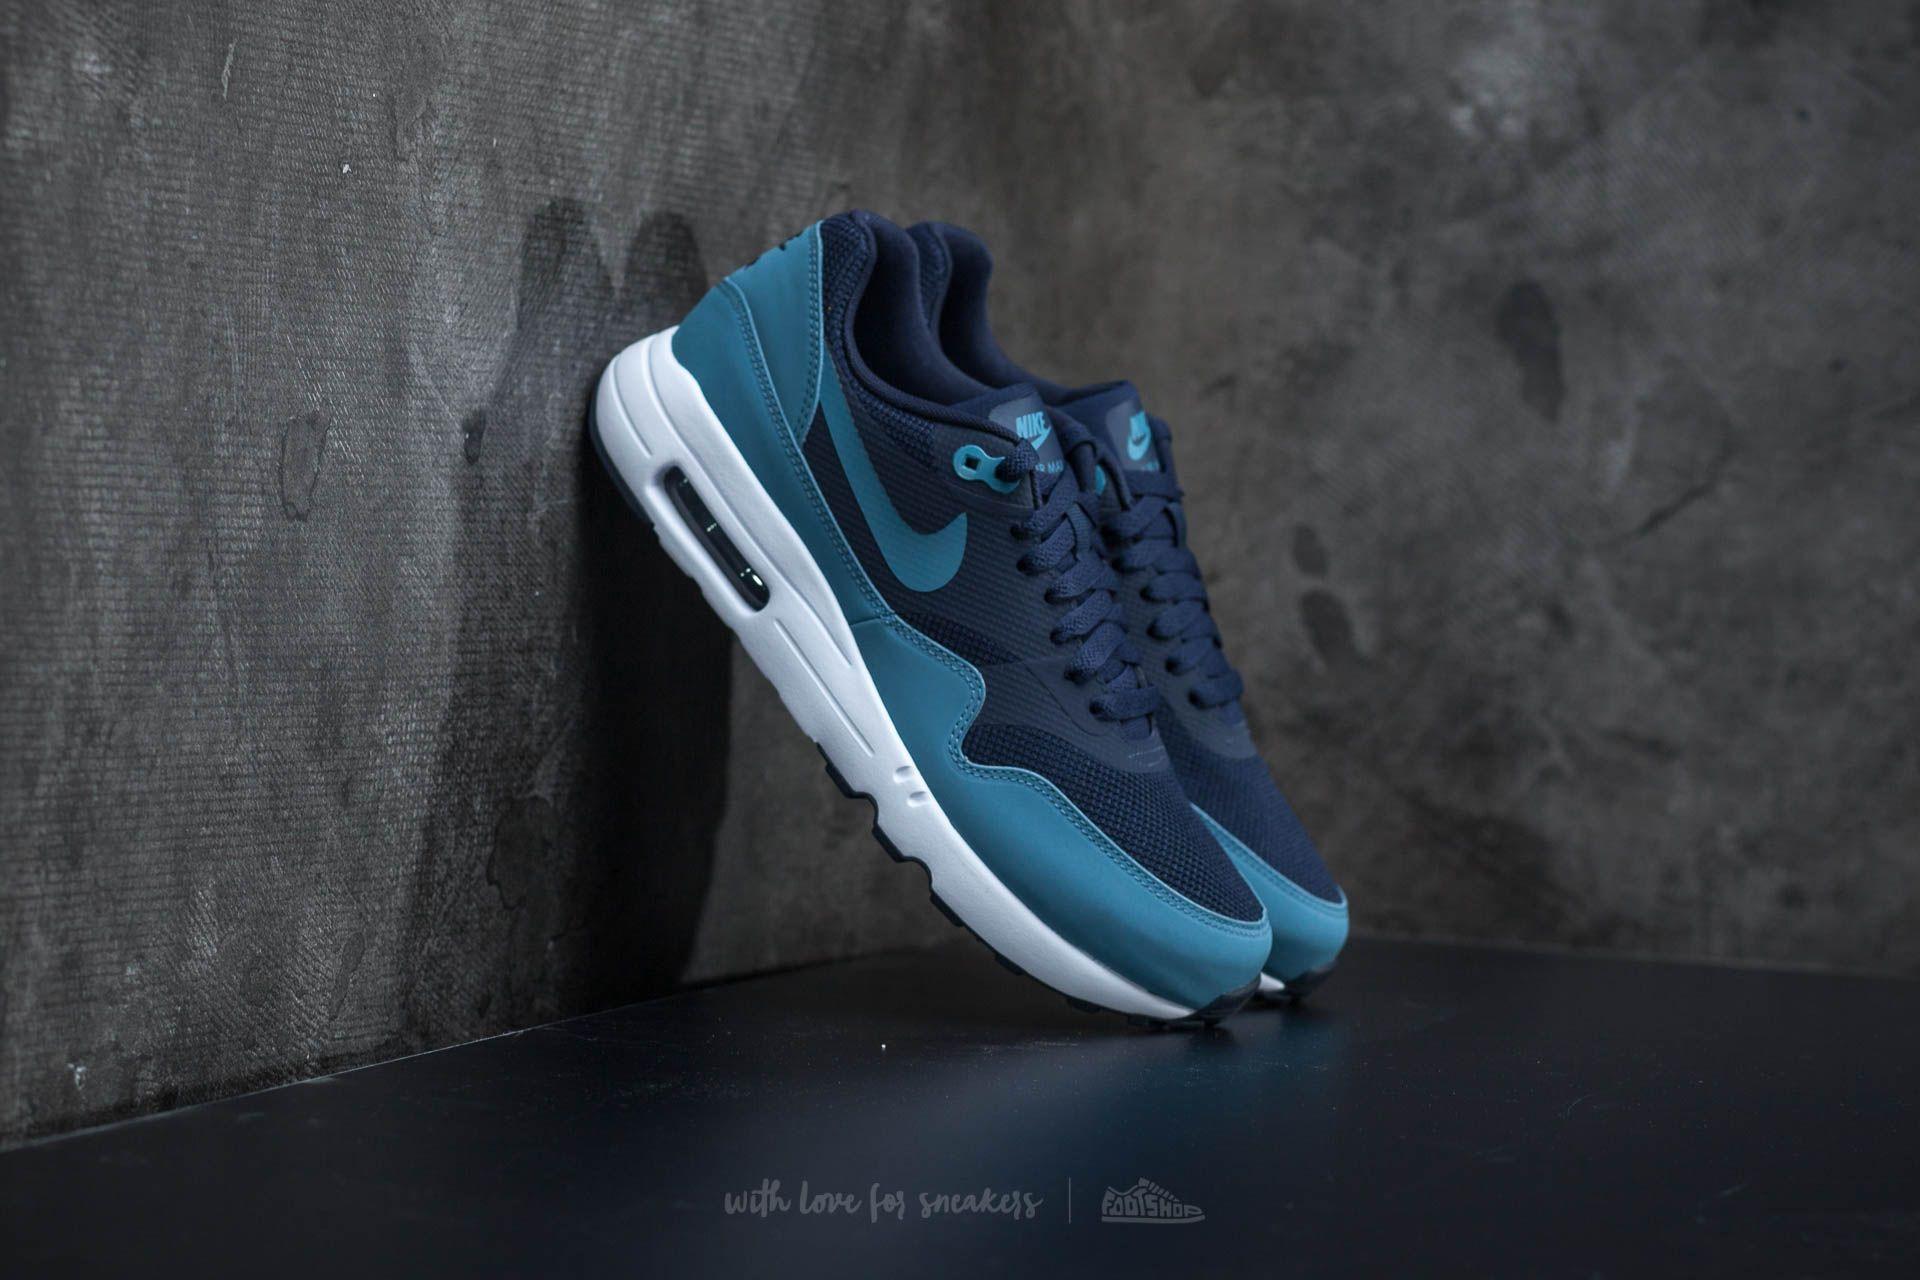 Nike Air Max 1 Ultra 2.0 Essential Obsidian/ Smokey Blue